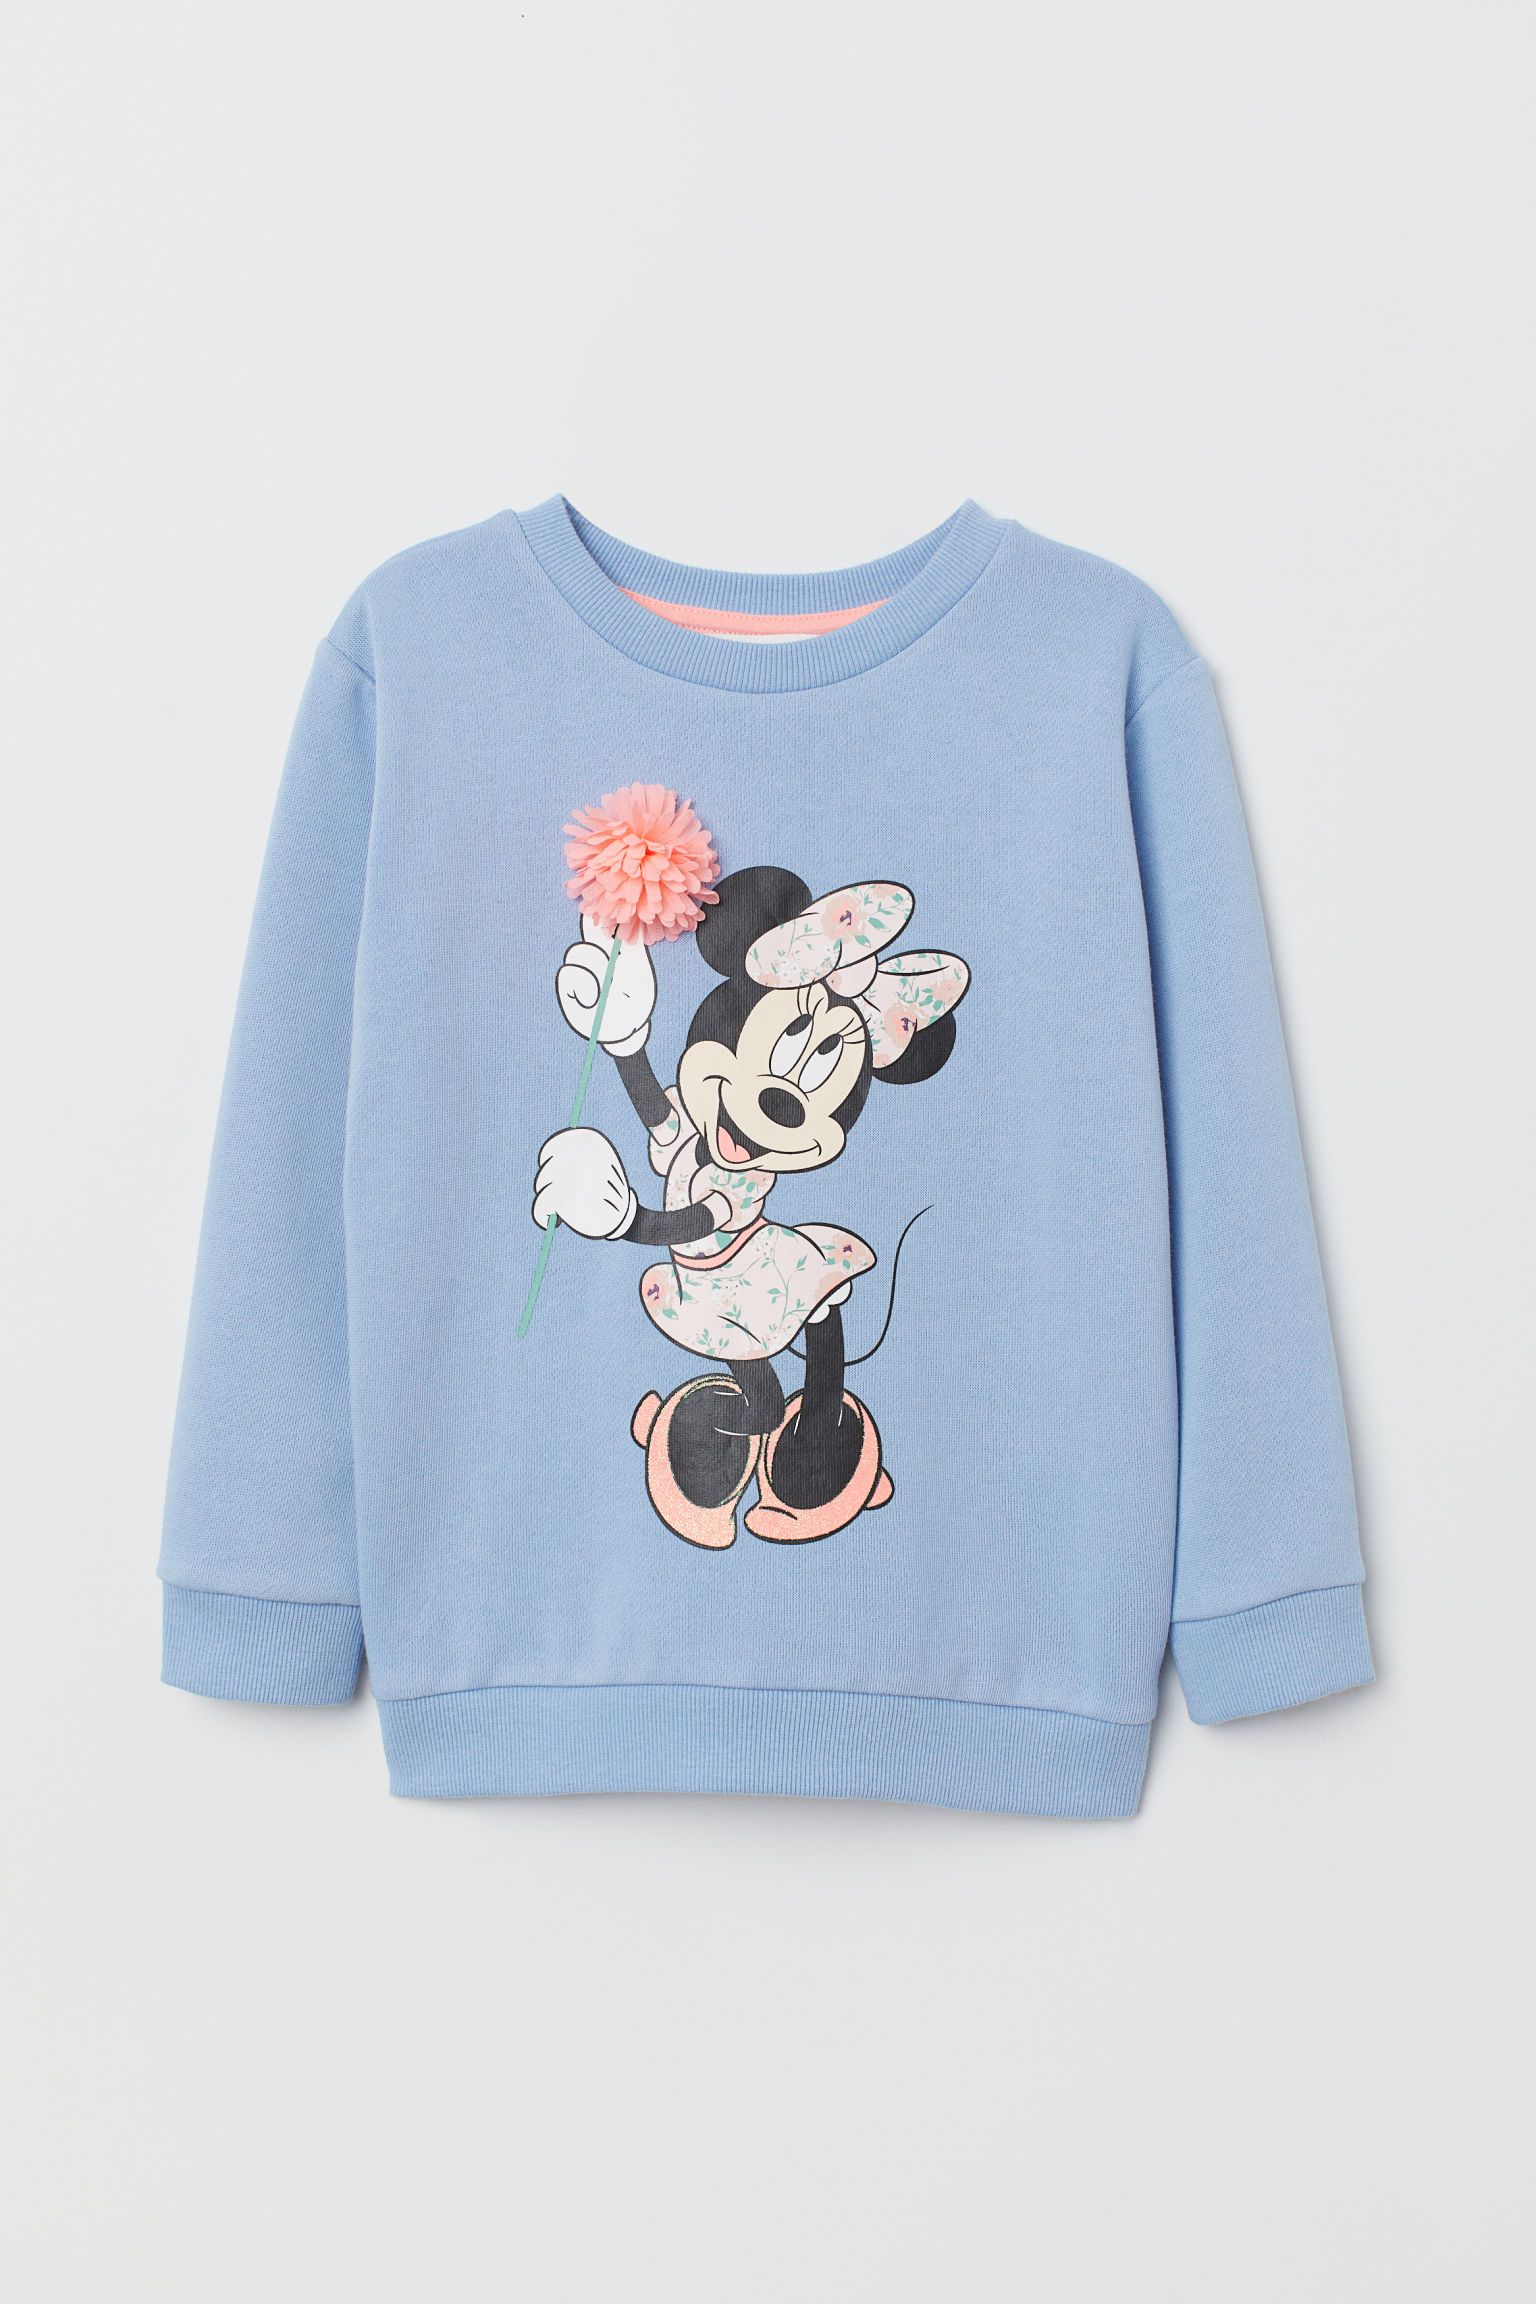 Kids Girls Disney Cartoon Hoodie Sweatshirt Outfits Clothes